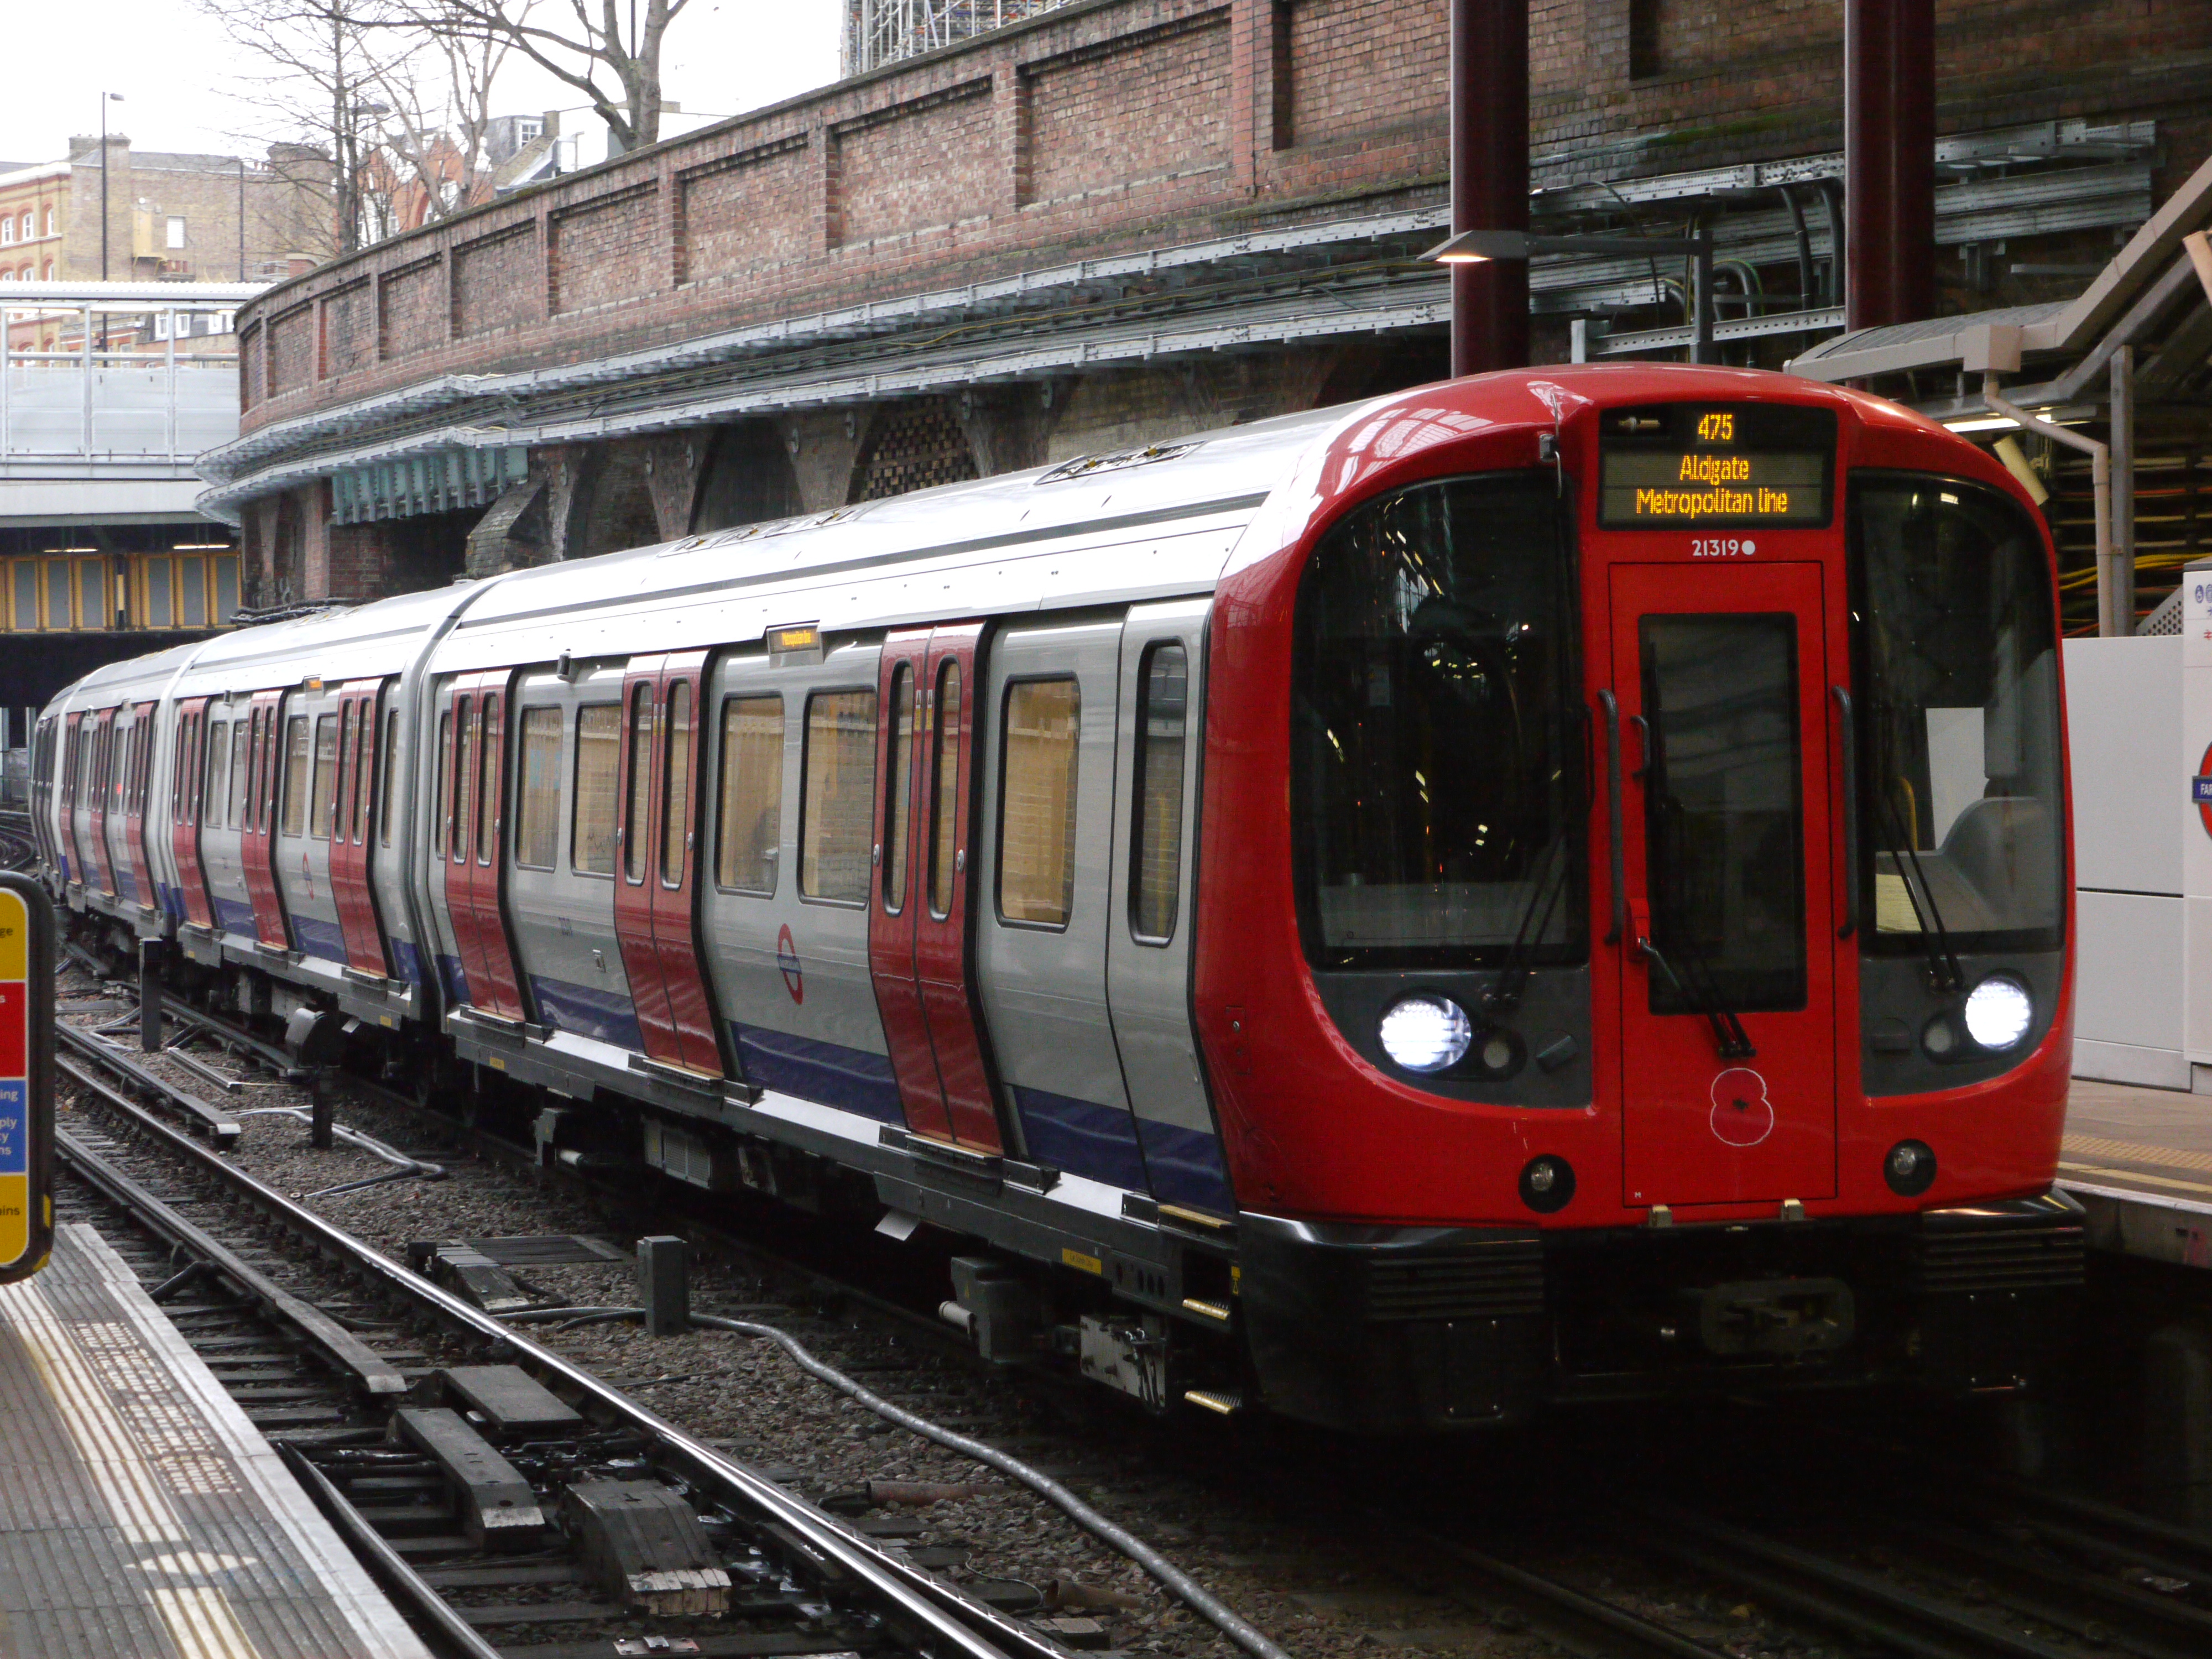 of Tube map inaccuracies London Vintage